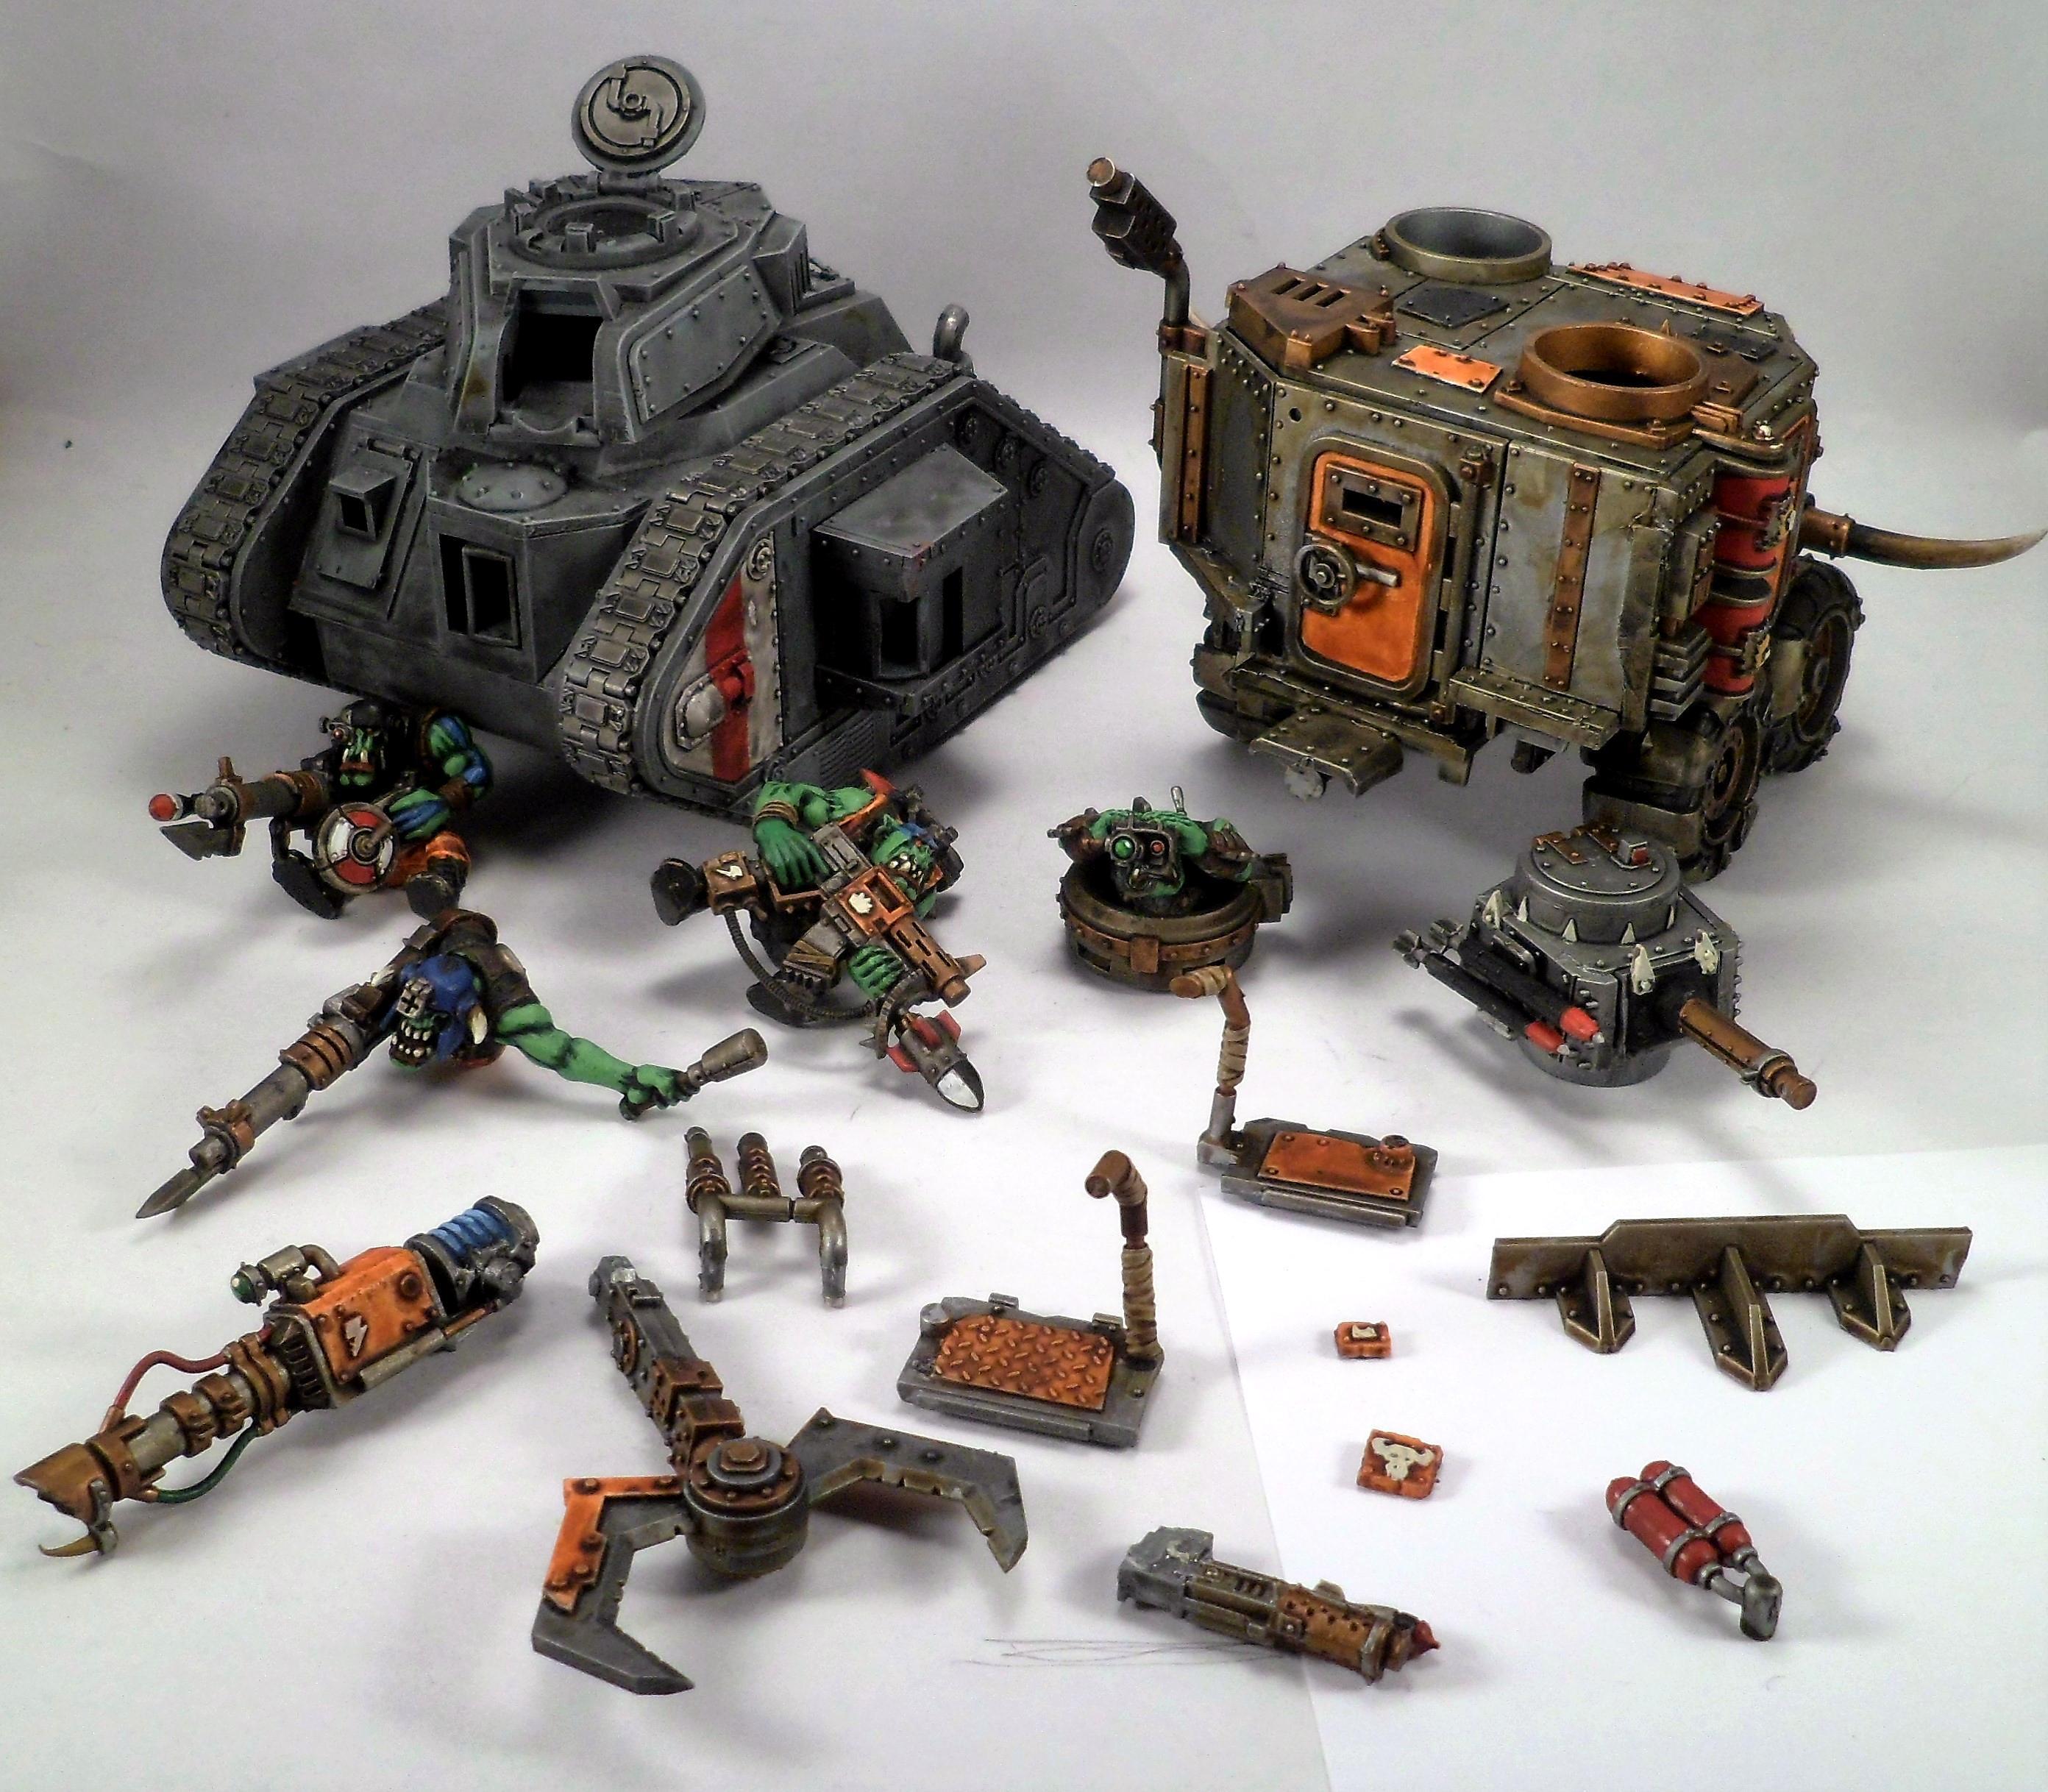 Battlewagon, Guard Abuse, Leman Russ, Looted, Looted Wagon, Tank